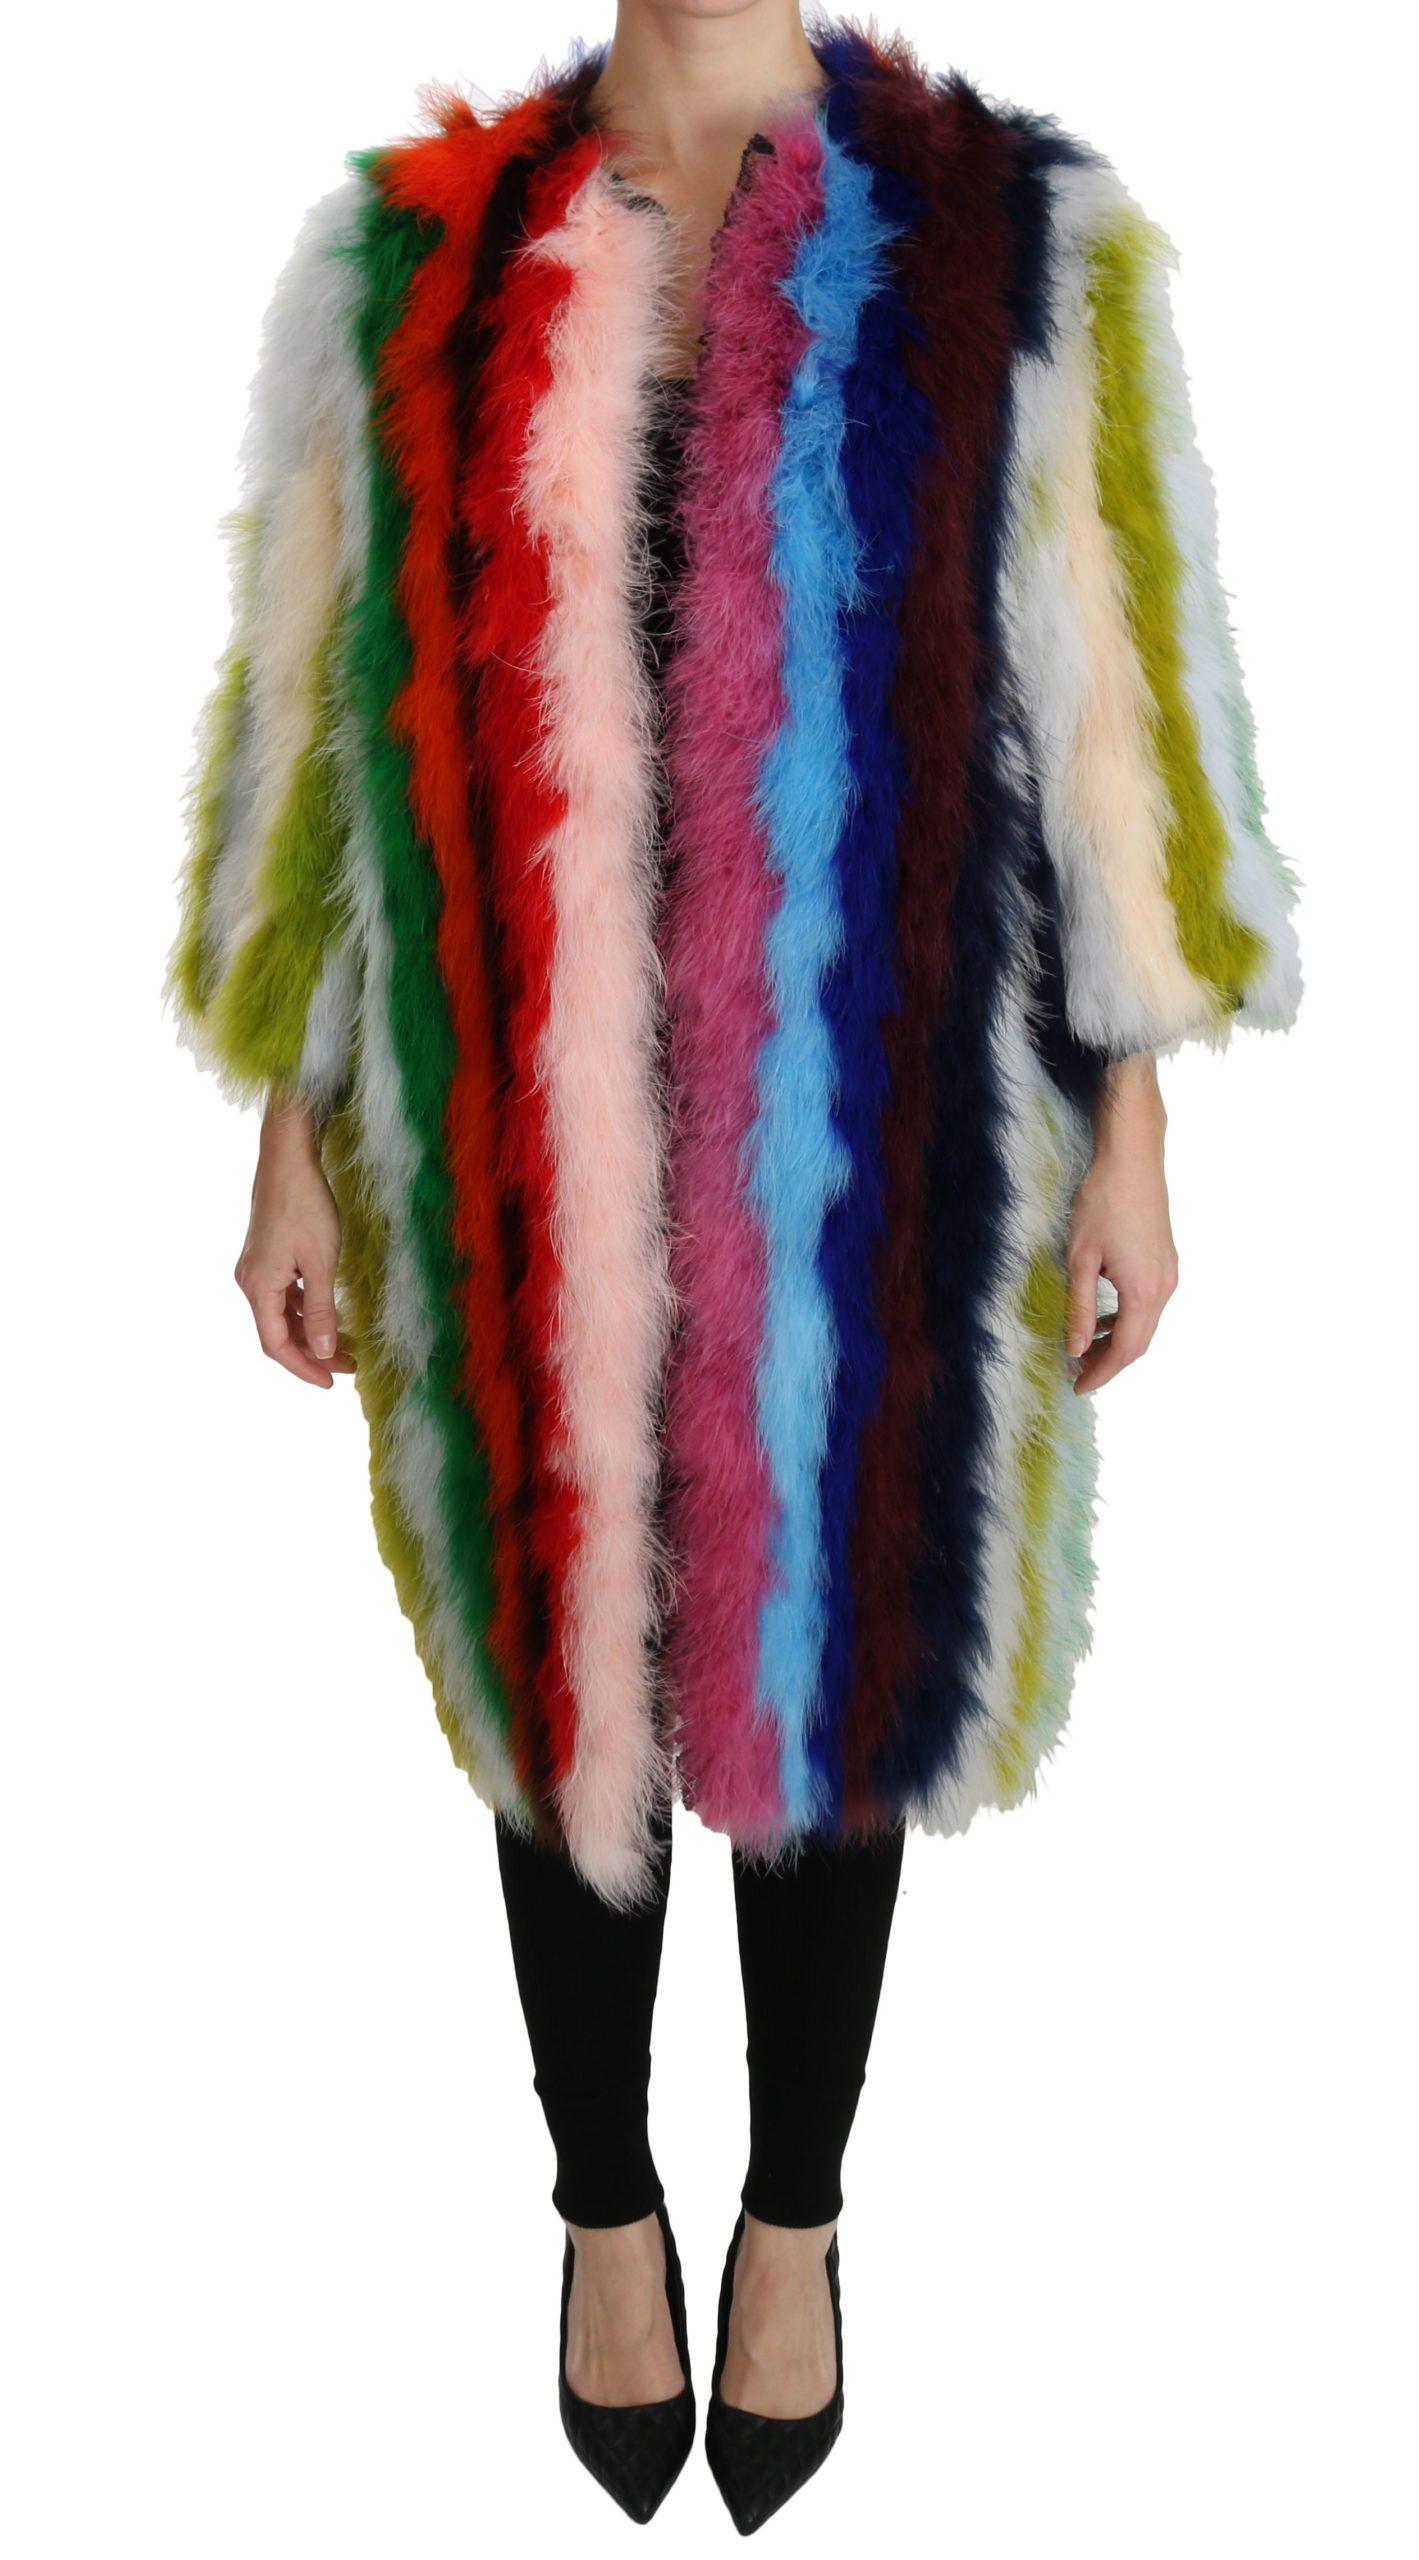 Dolce & Gabbana Women's Turkey Feather Cape Fur Coat Multicolor JKT2511 - IT40 S